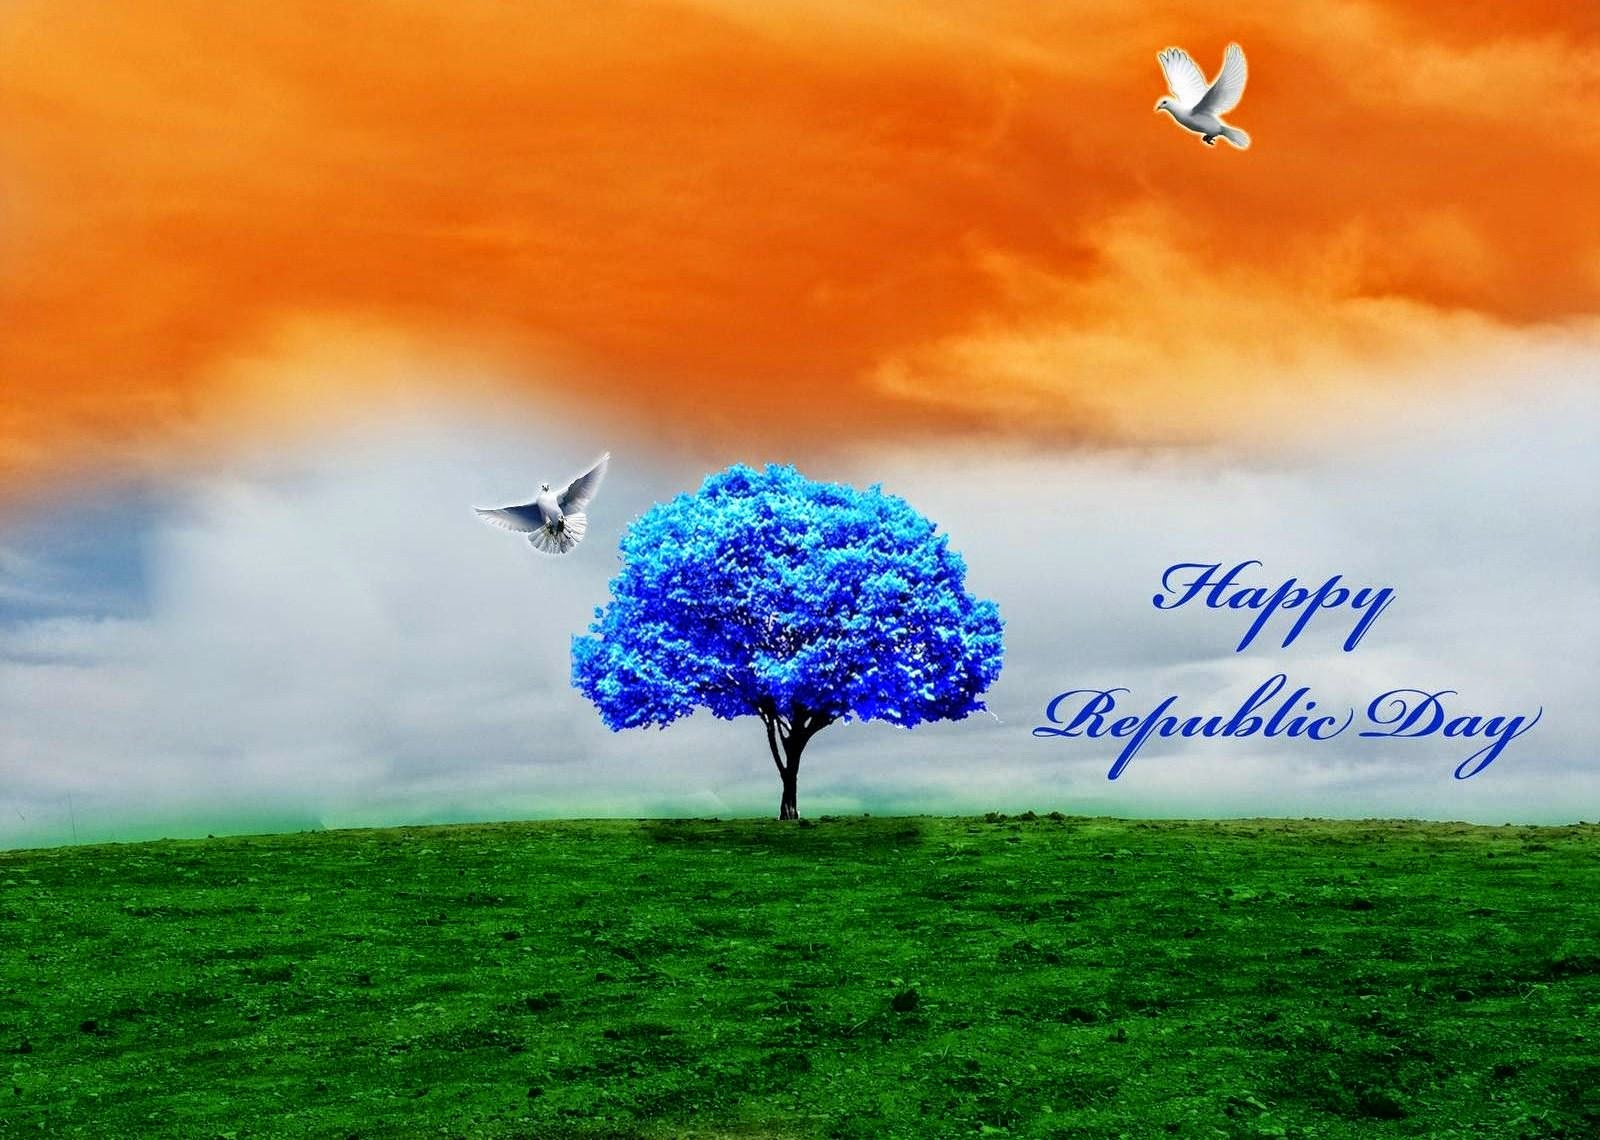 Holiday Republic Day/Gantantra Diwas 2018 SMS, Images,Celebration